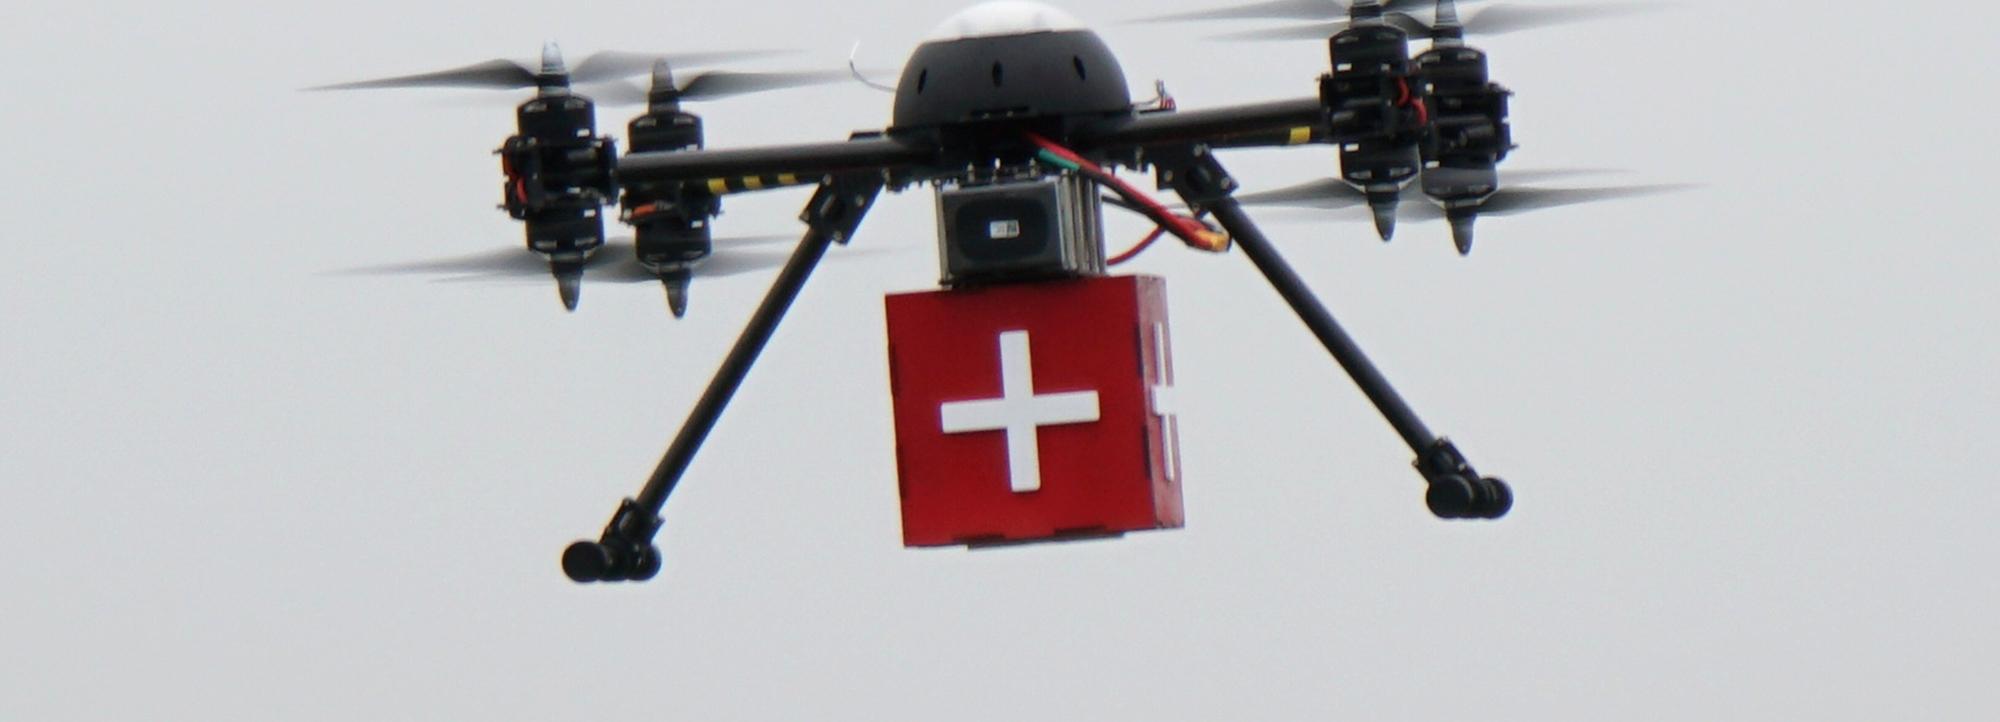 Health Drones - University of Southern Denmark, SDU